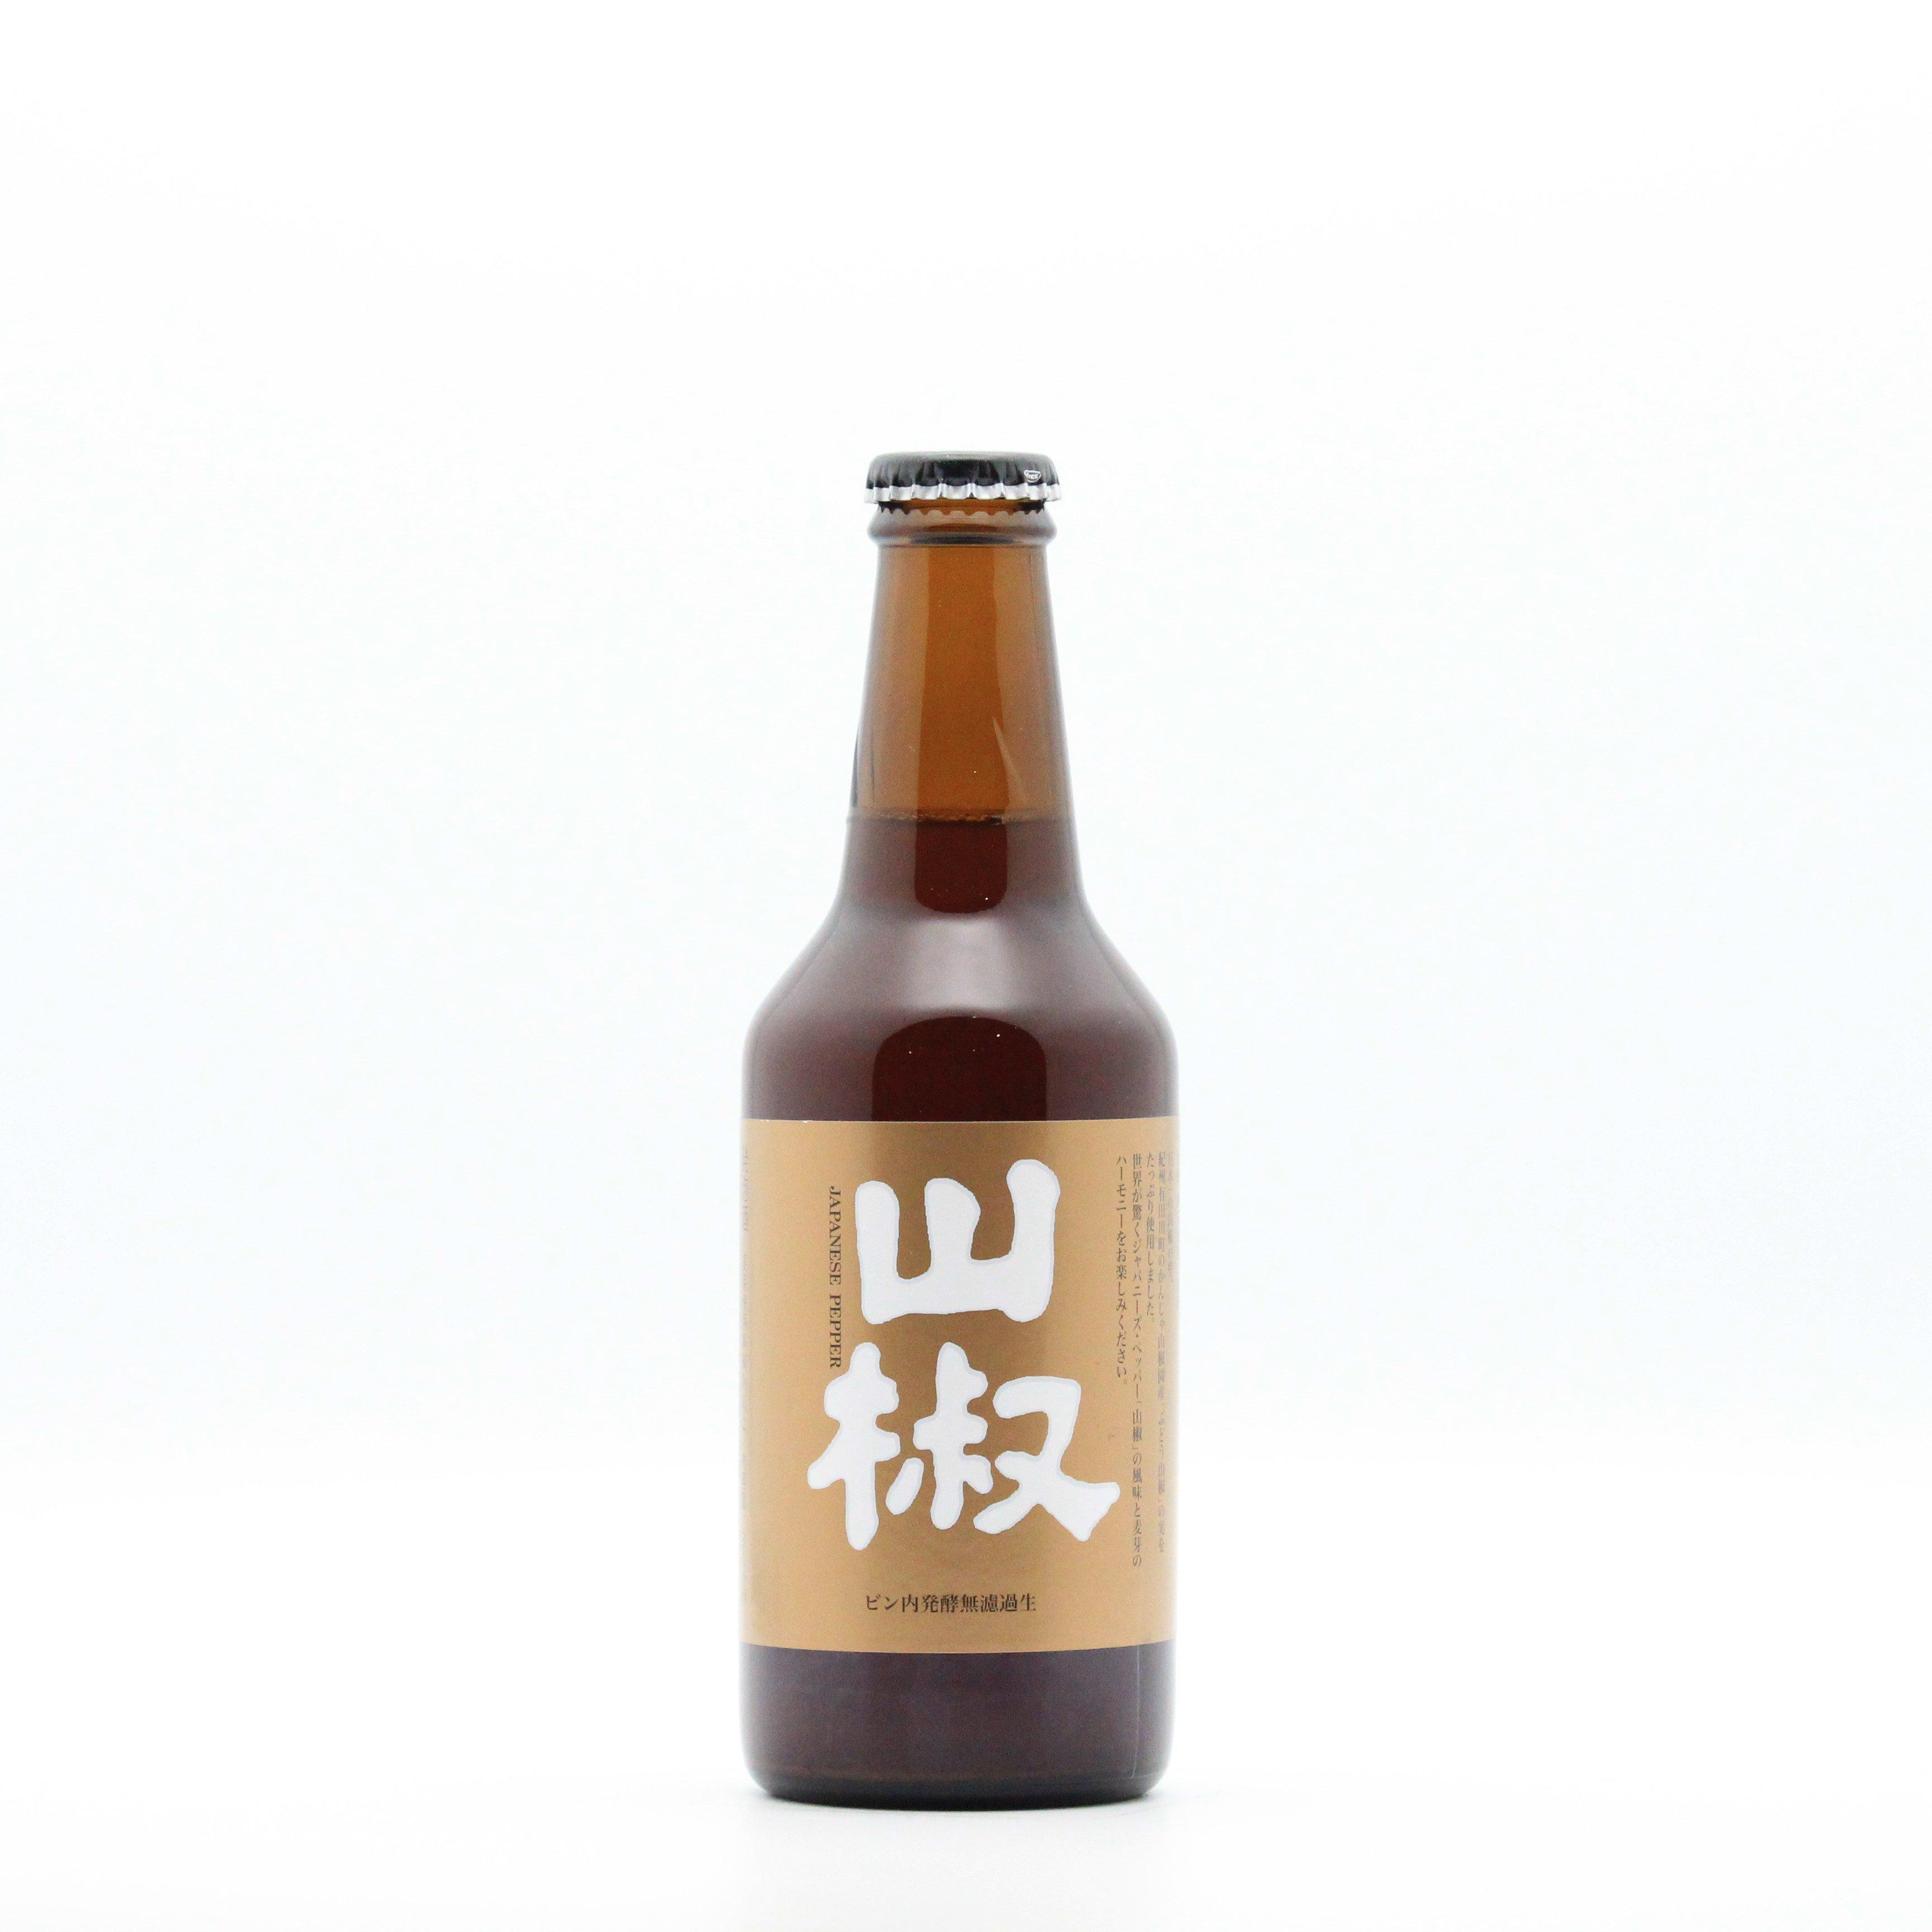 <img class='new_mark_img1' src='https://img.shop-pro.jp/img/new/icons2.gif' style='border:none;display:inline;margin:0px;padding:0px;width:auto;' />新潟麦酒/山椒ビール 310ml